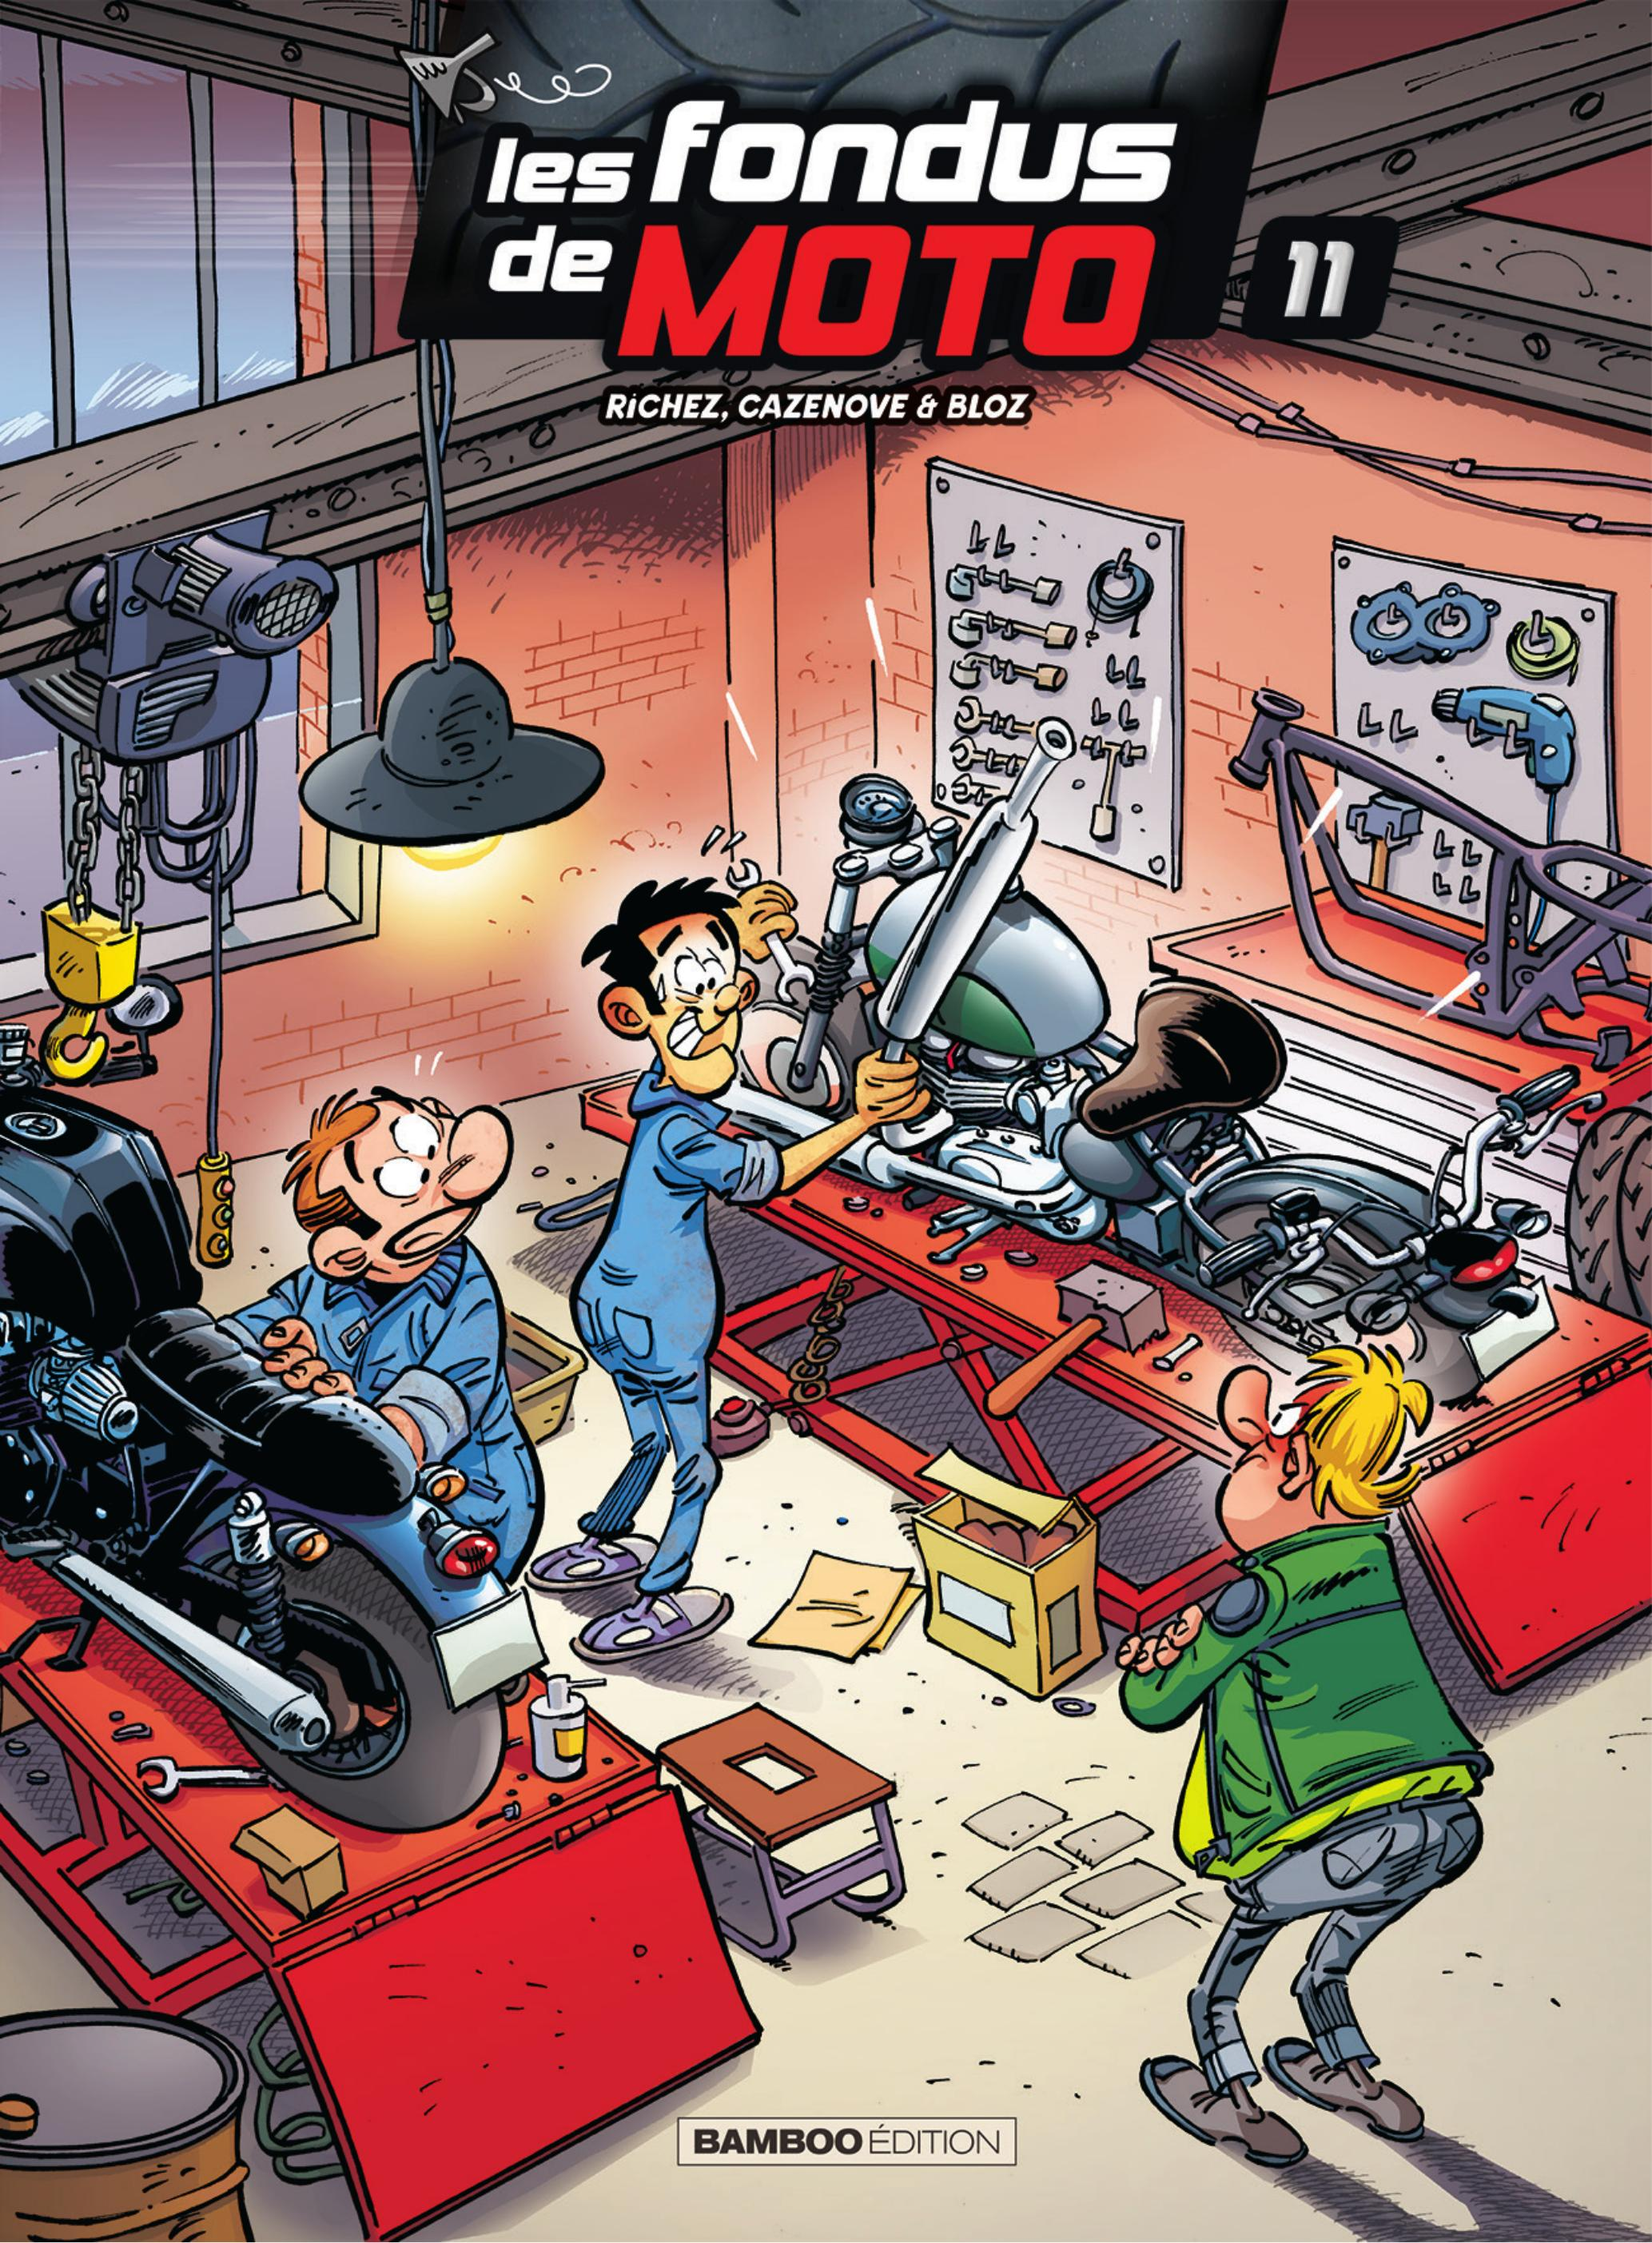 Les fondus de moto 11 - 11